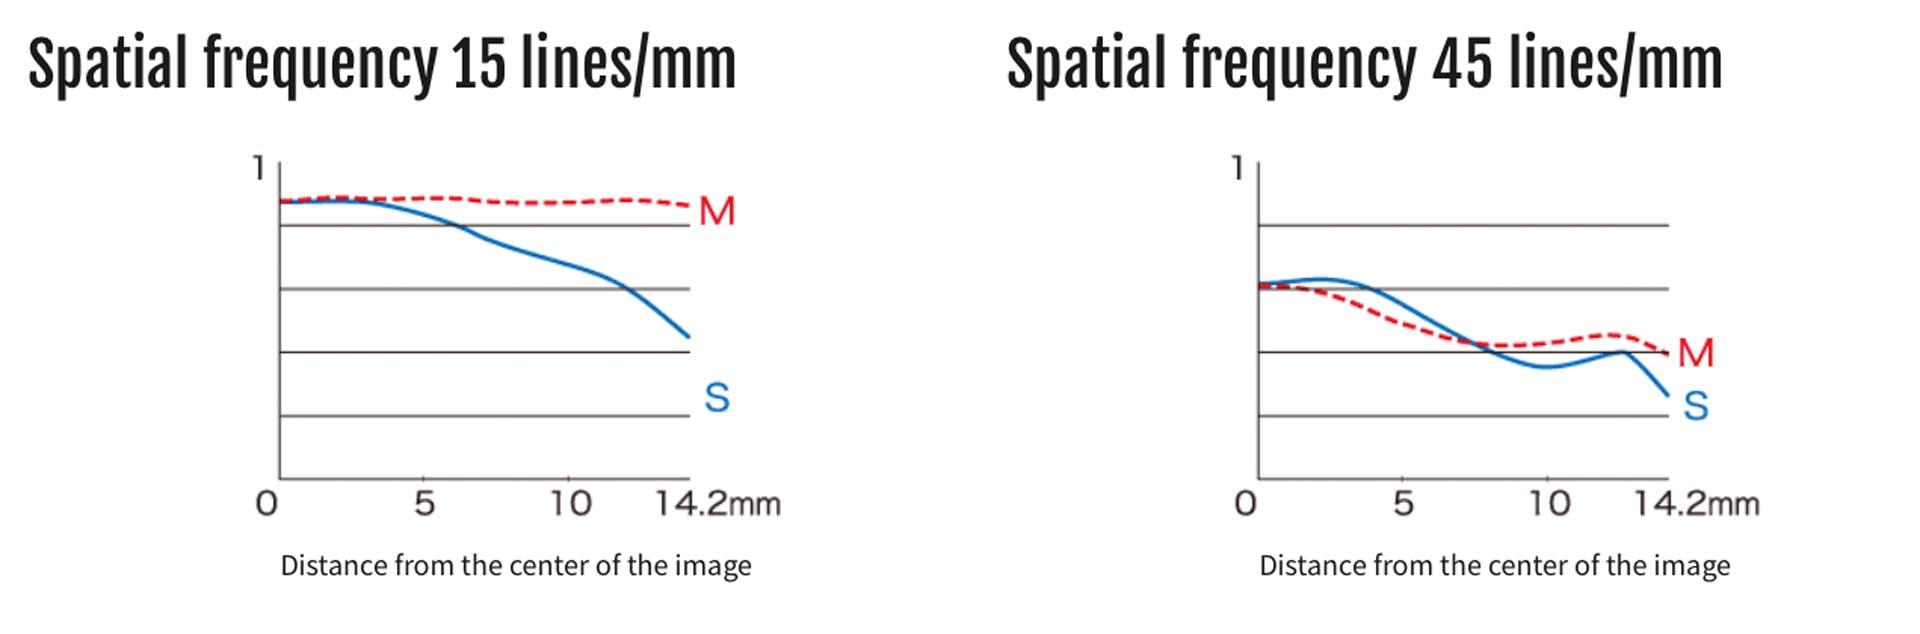 De MTF-curve van de oudere Fujinon XF 35mm F1.4